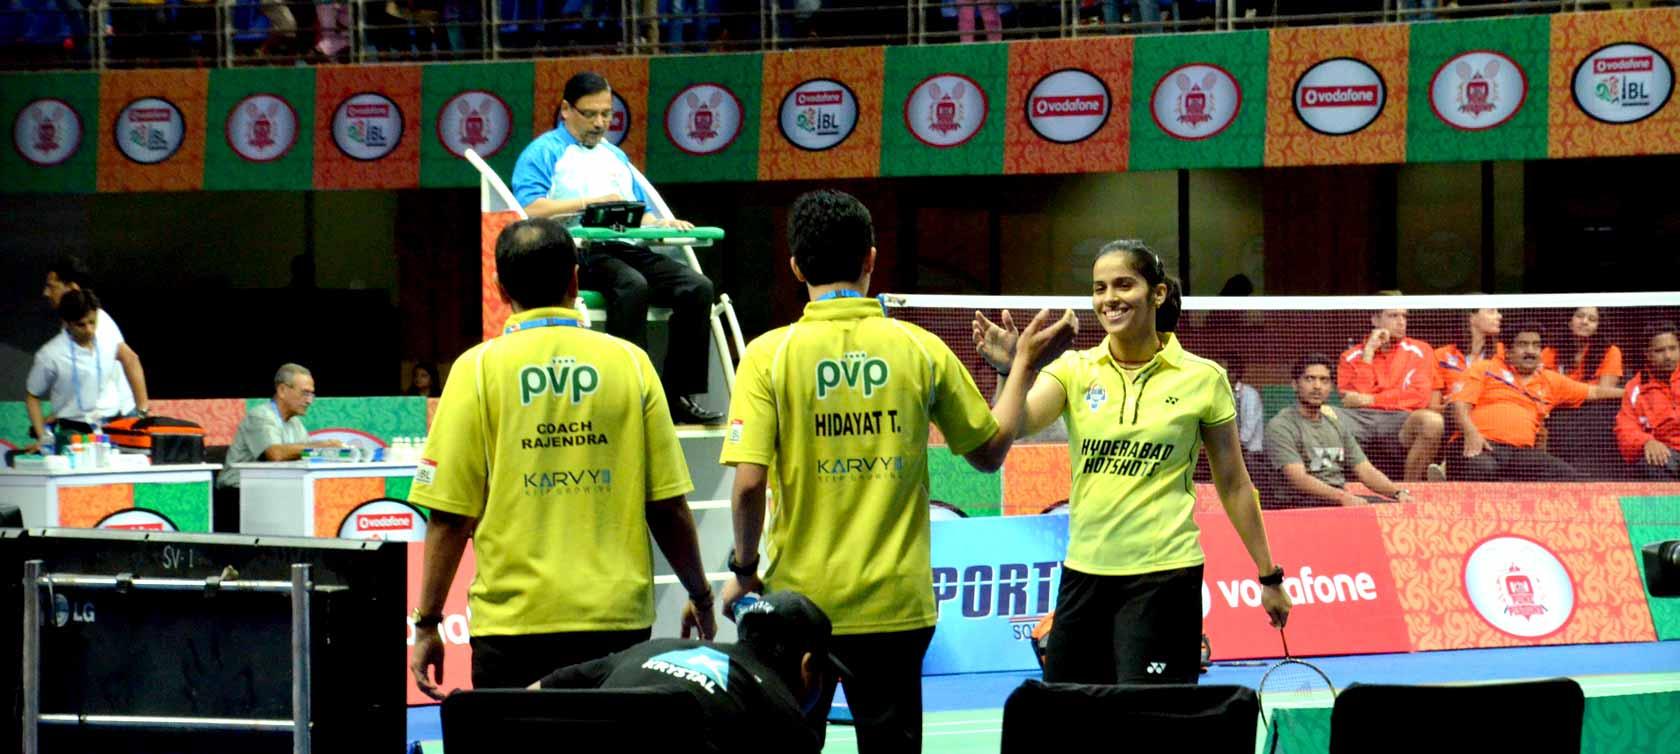 IBL 2013 (Indian Badminton League)